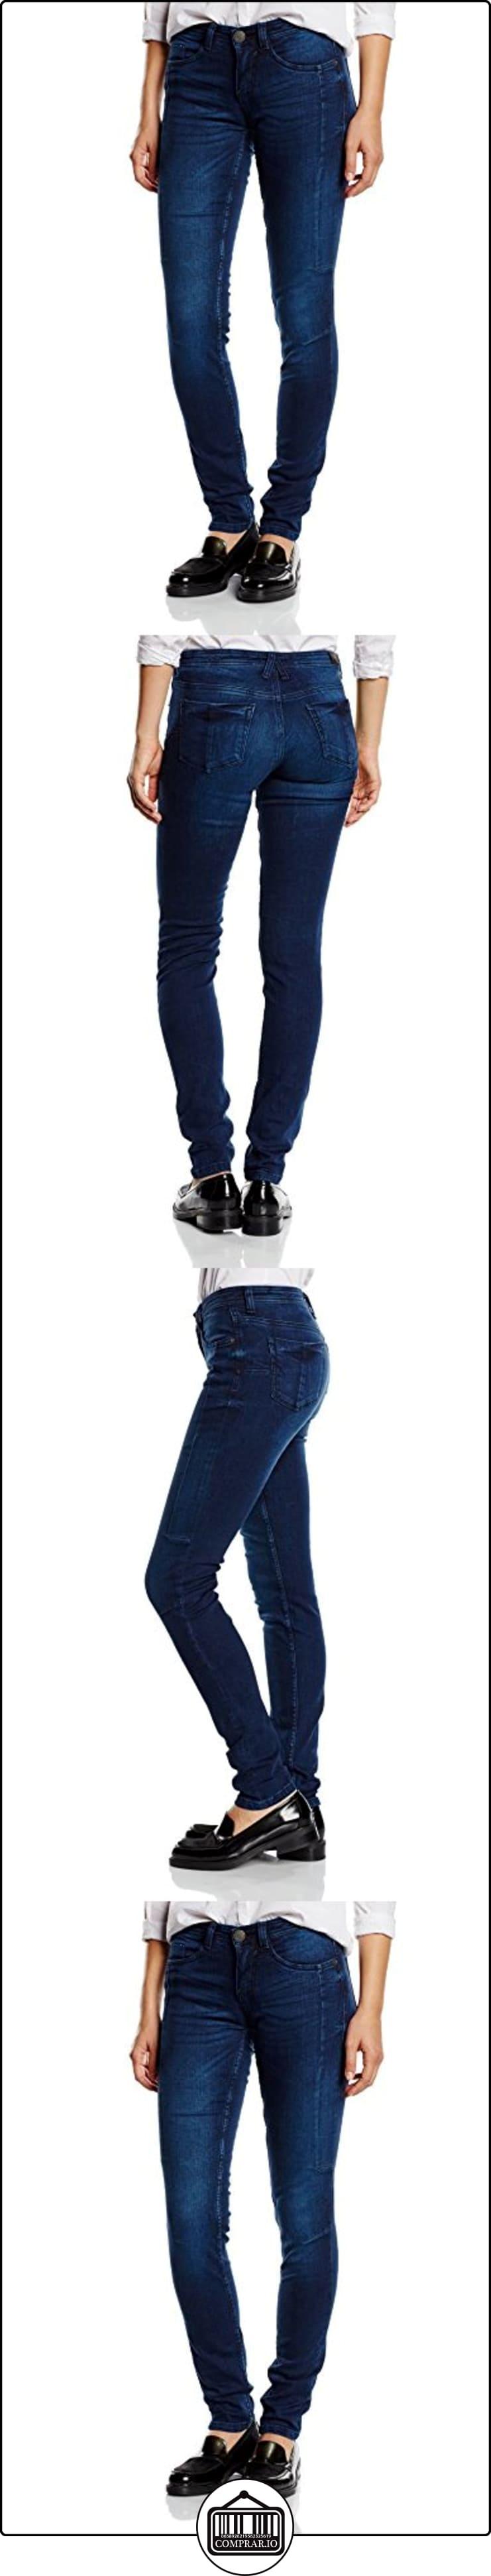 H.I.S Jeans Cherry-Vaqueros Mujer,, Blau (Gloomy blue 9651), 38W/33L  ✿ Vaqueros ✿